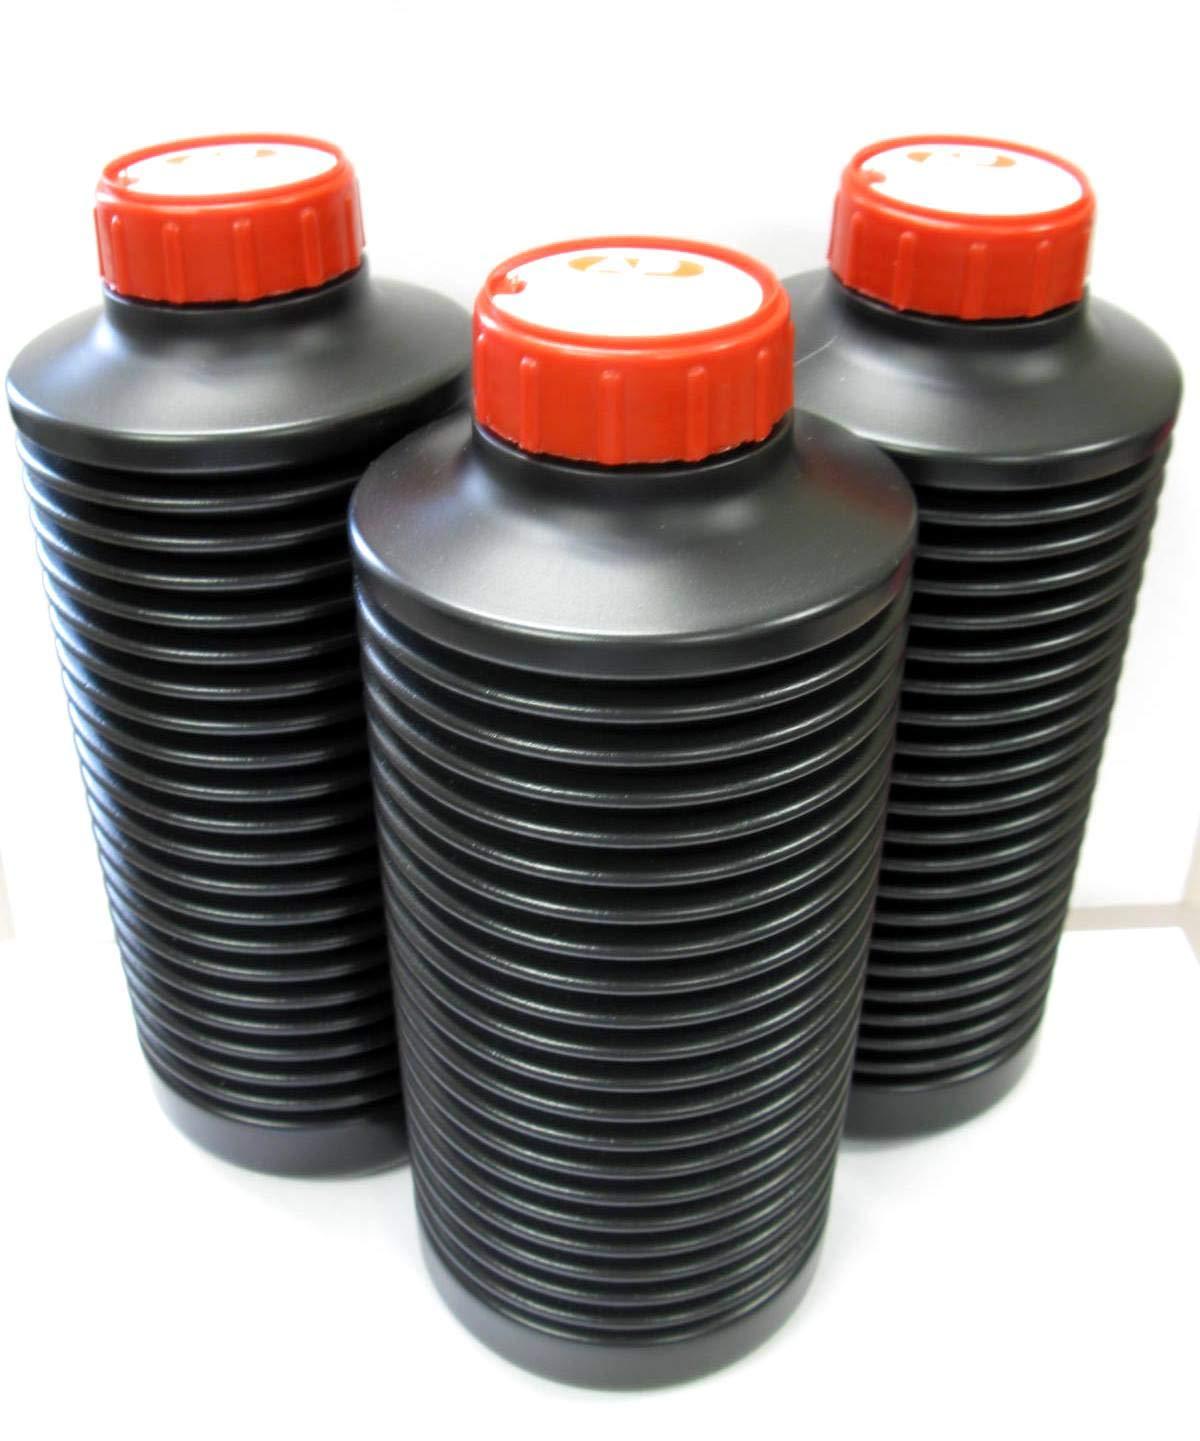 Three AP Air Reduction Air-Evac Darkroom Chemical Storage 1-Liter Bottles by AP Plastics